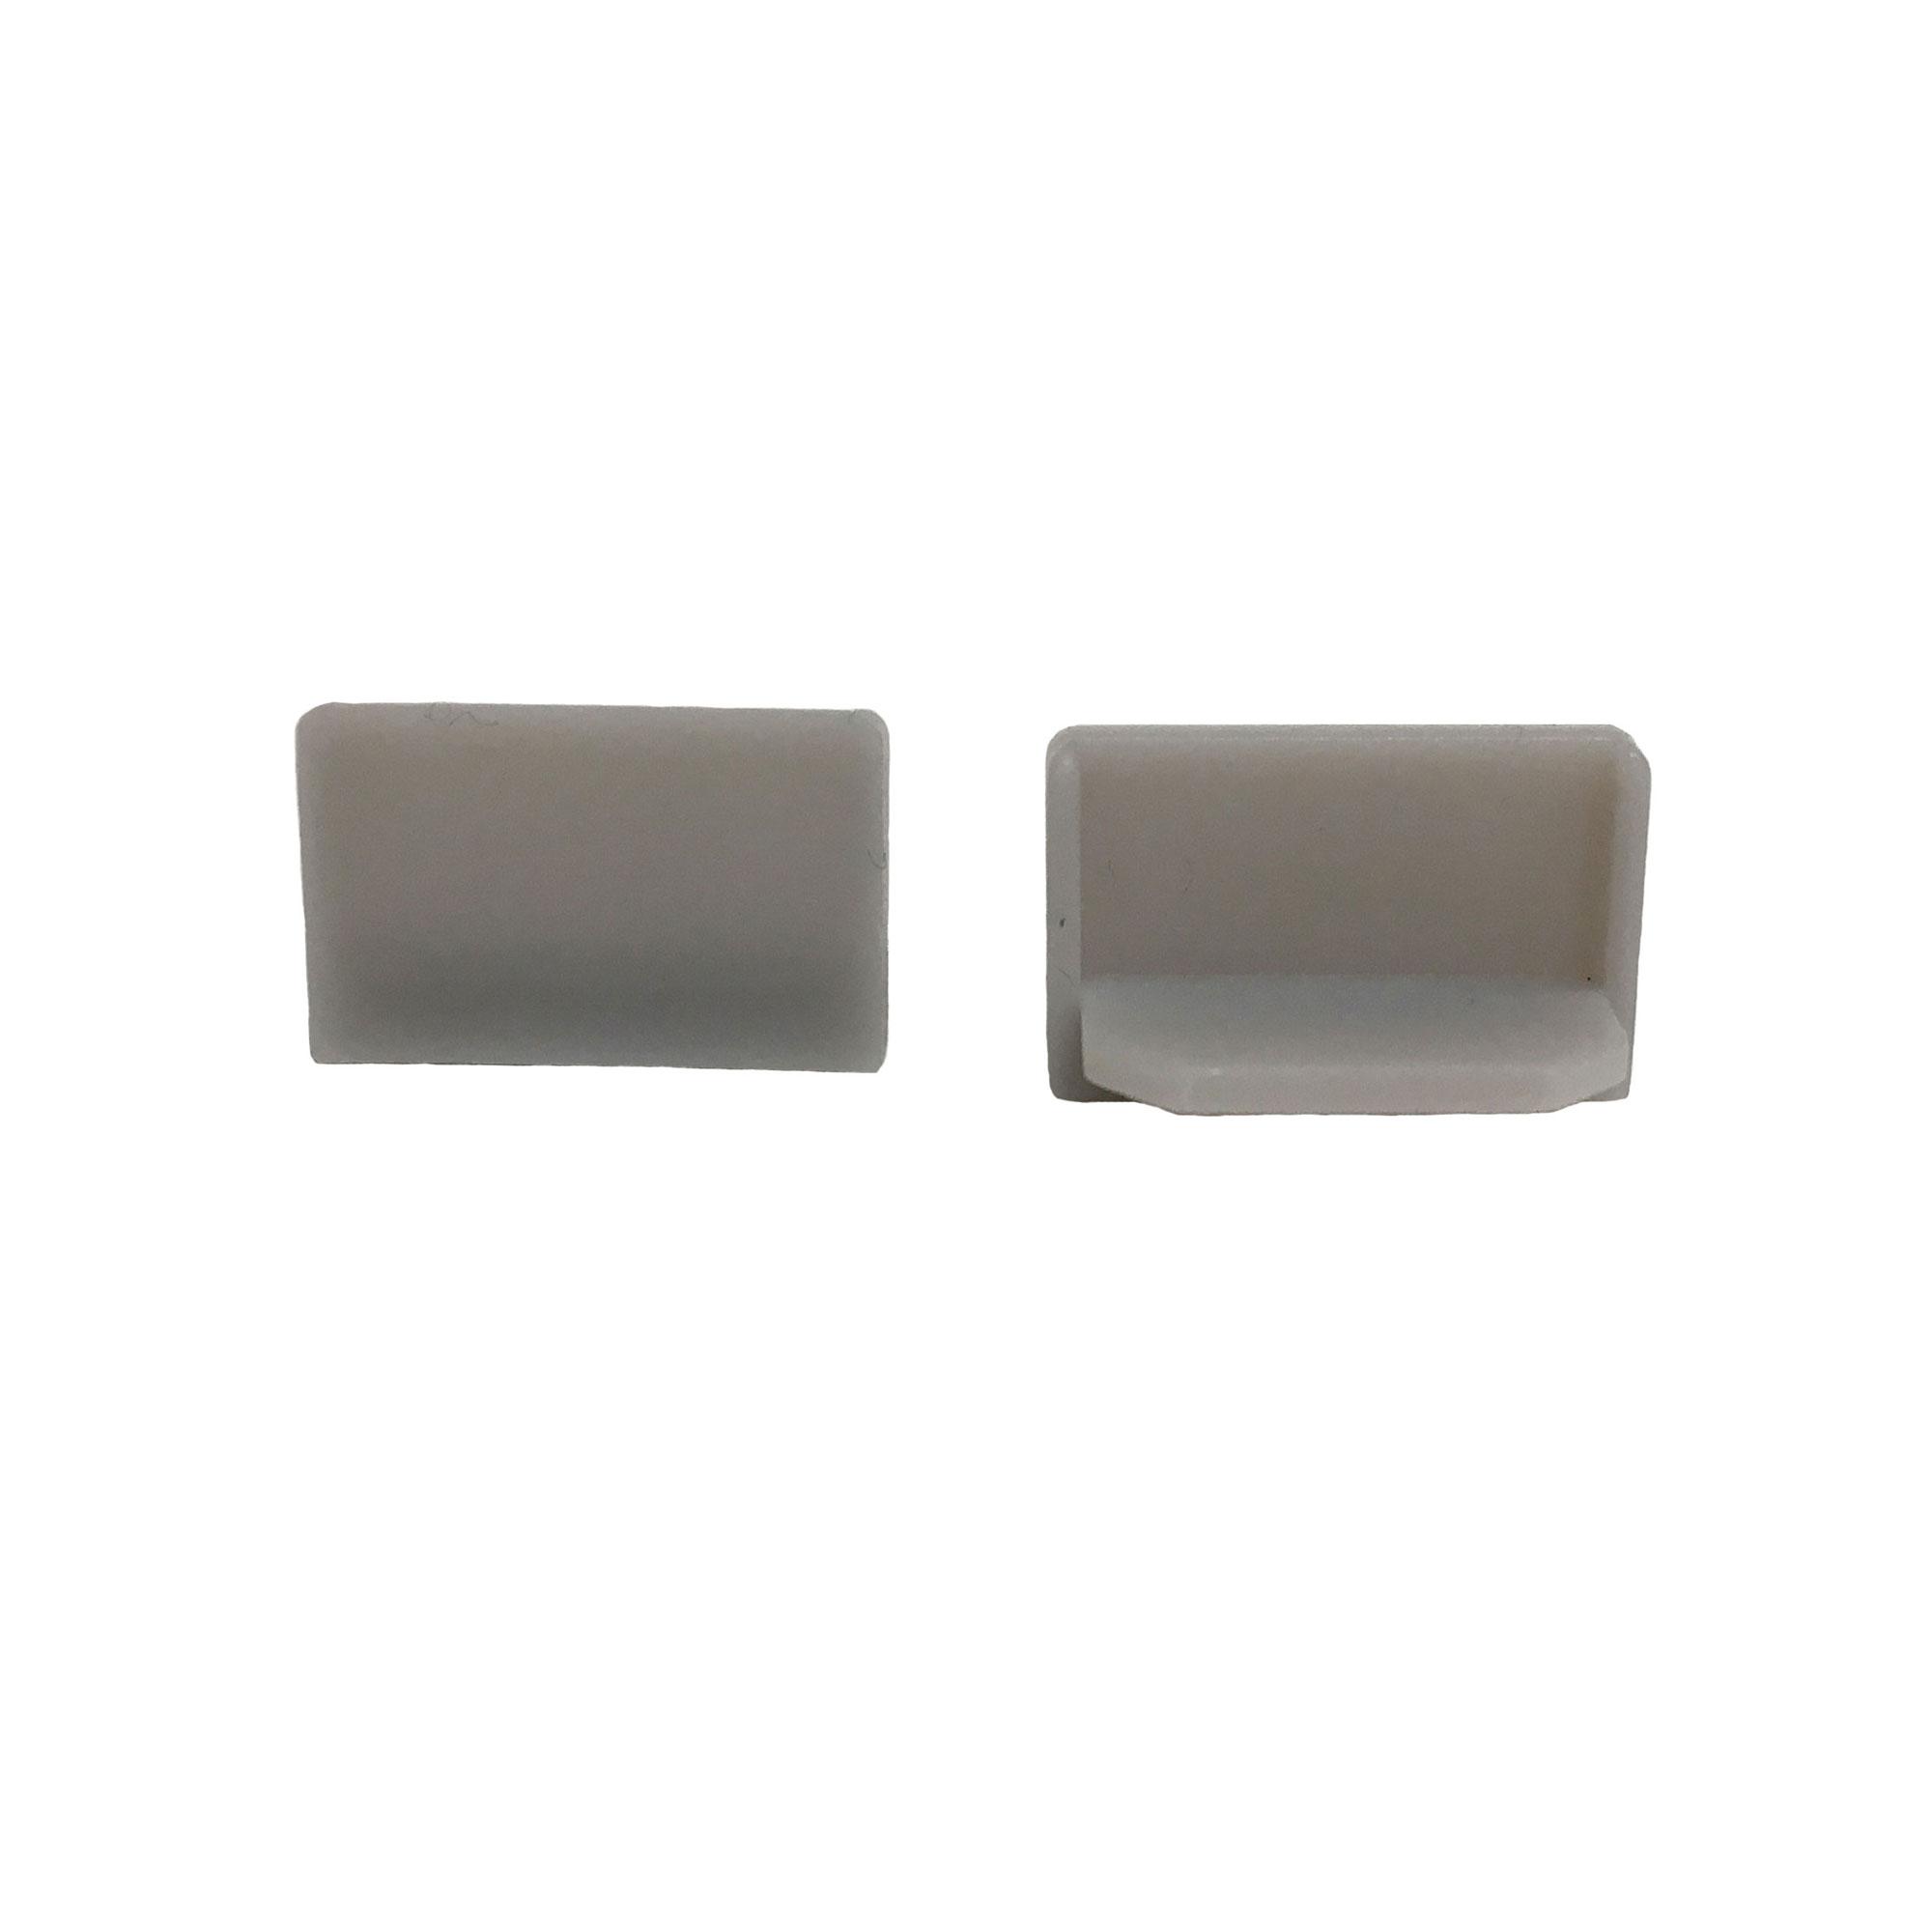 End Cap Snap Channel Airelight ES 0.5 (Light Grey)